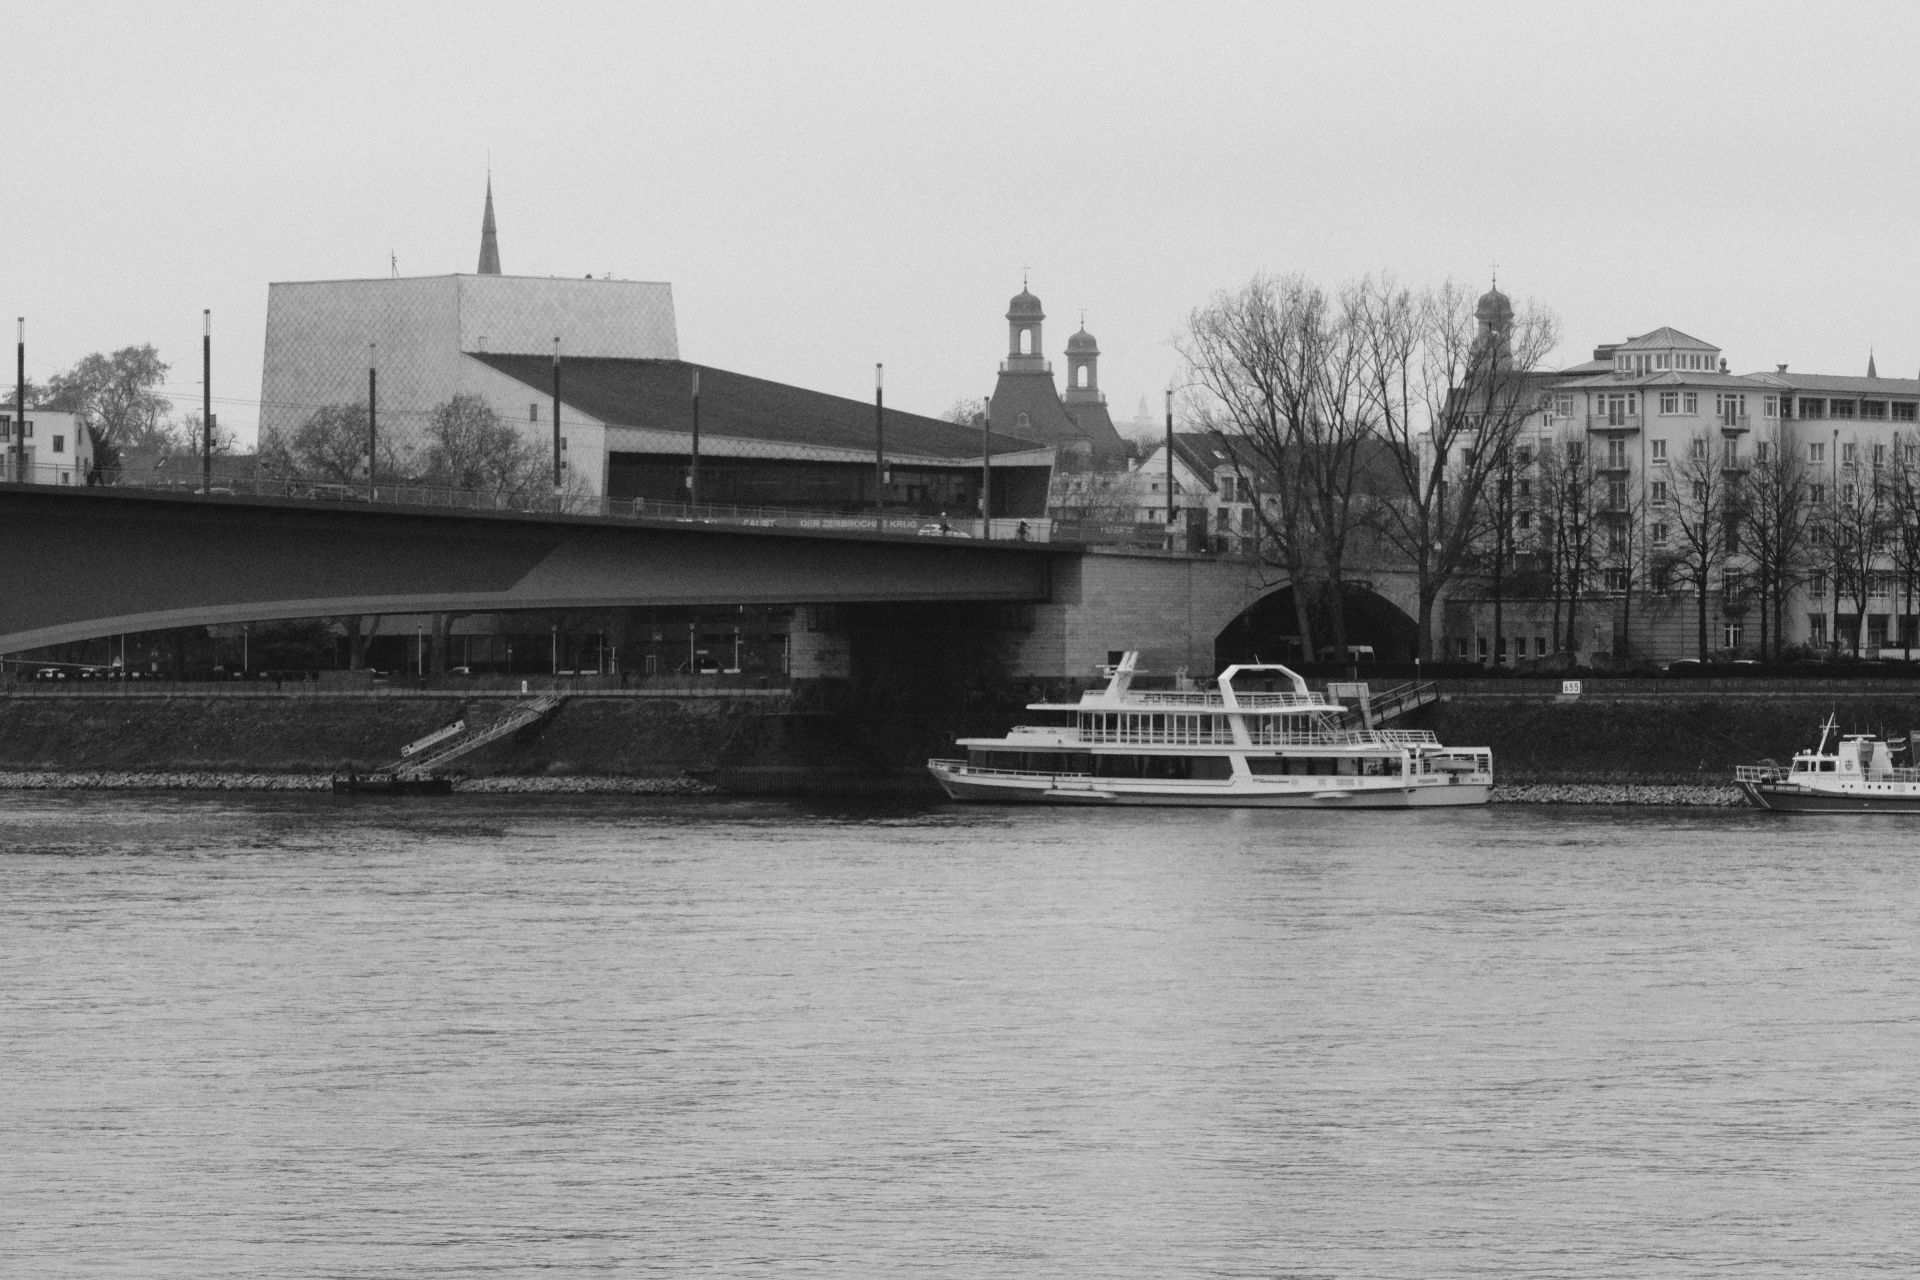 Kennedybrücke f/16 1/500sec ISO-5000 98.6mm